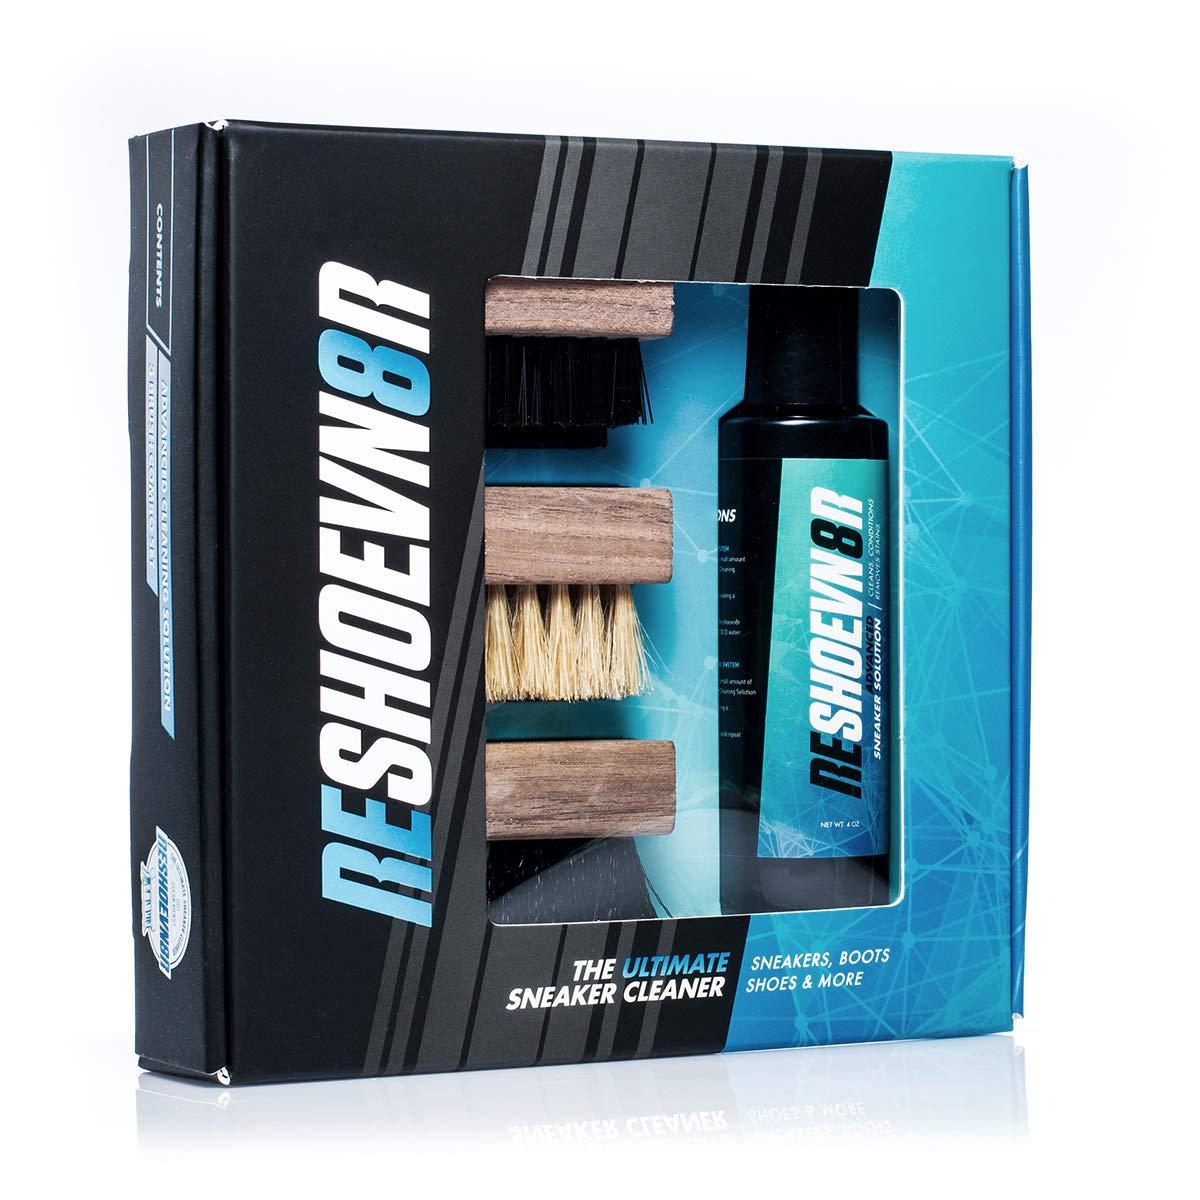 Reshoevn8r 4 oz. 3 Brush Shoe Cleaning